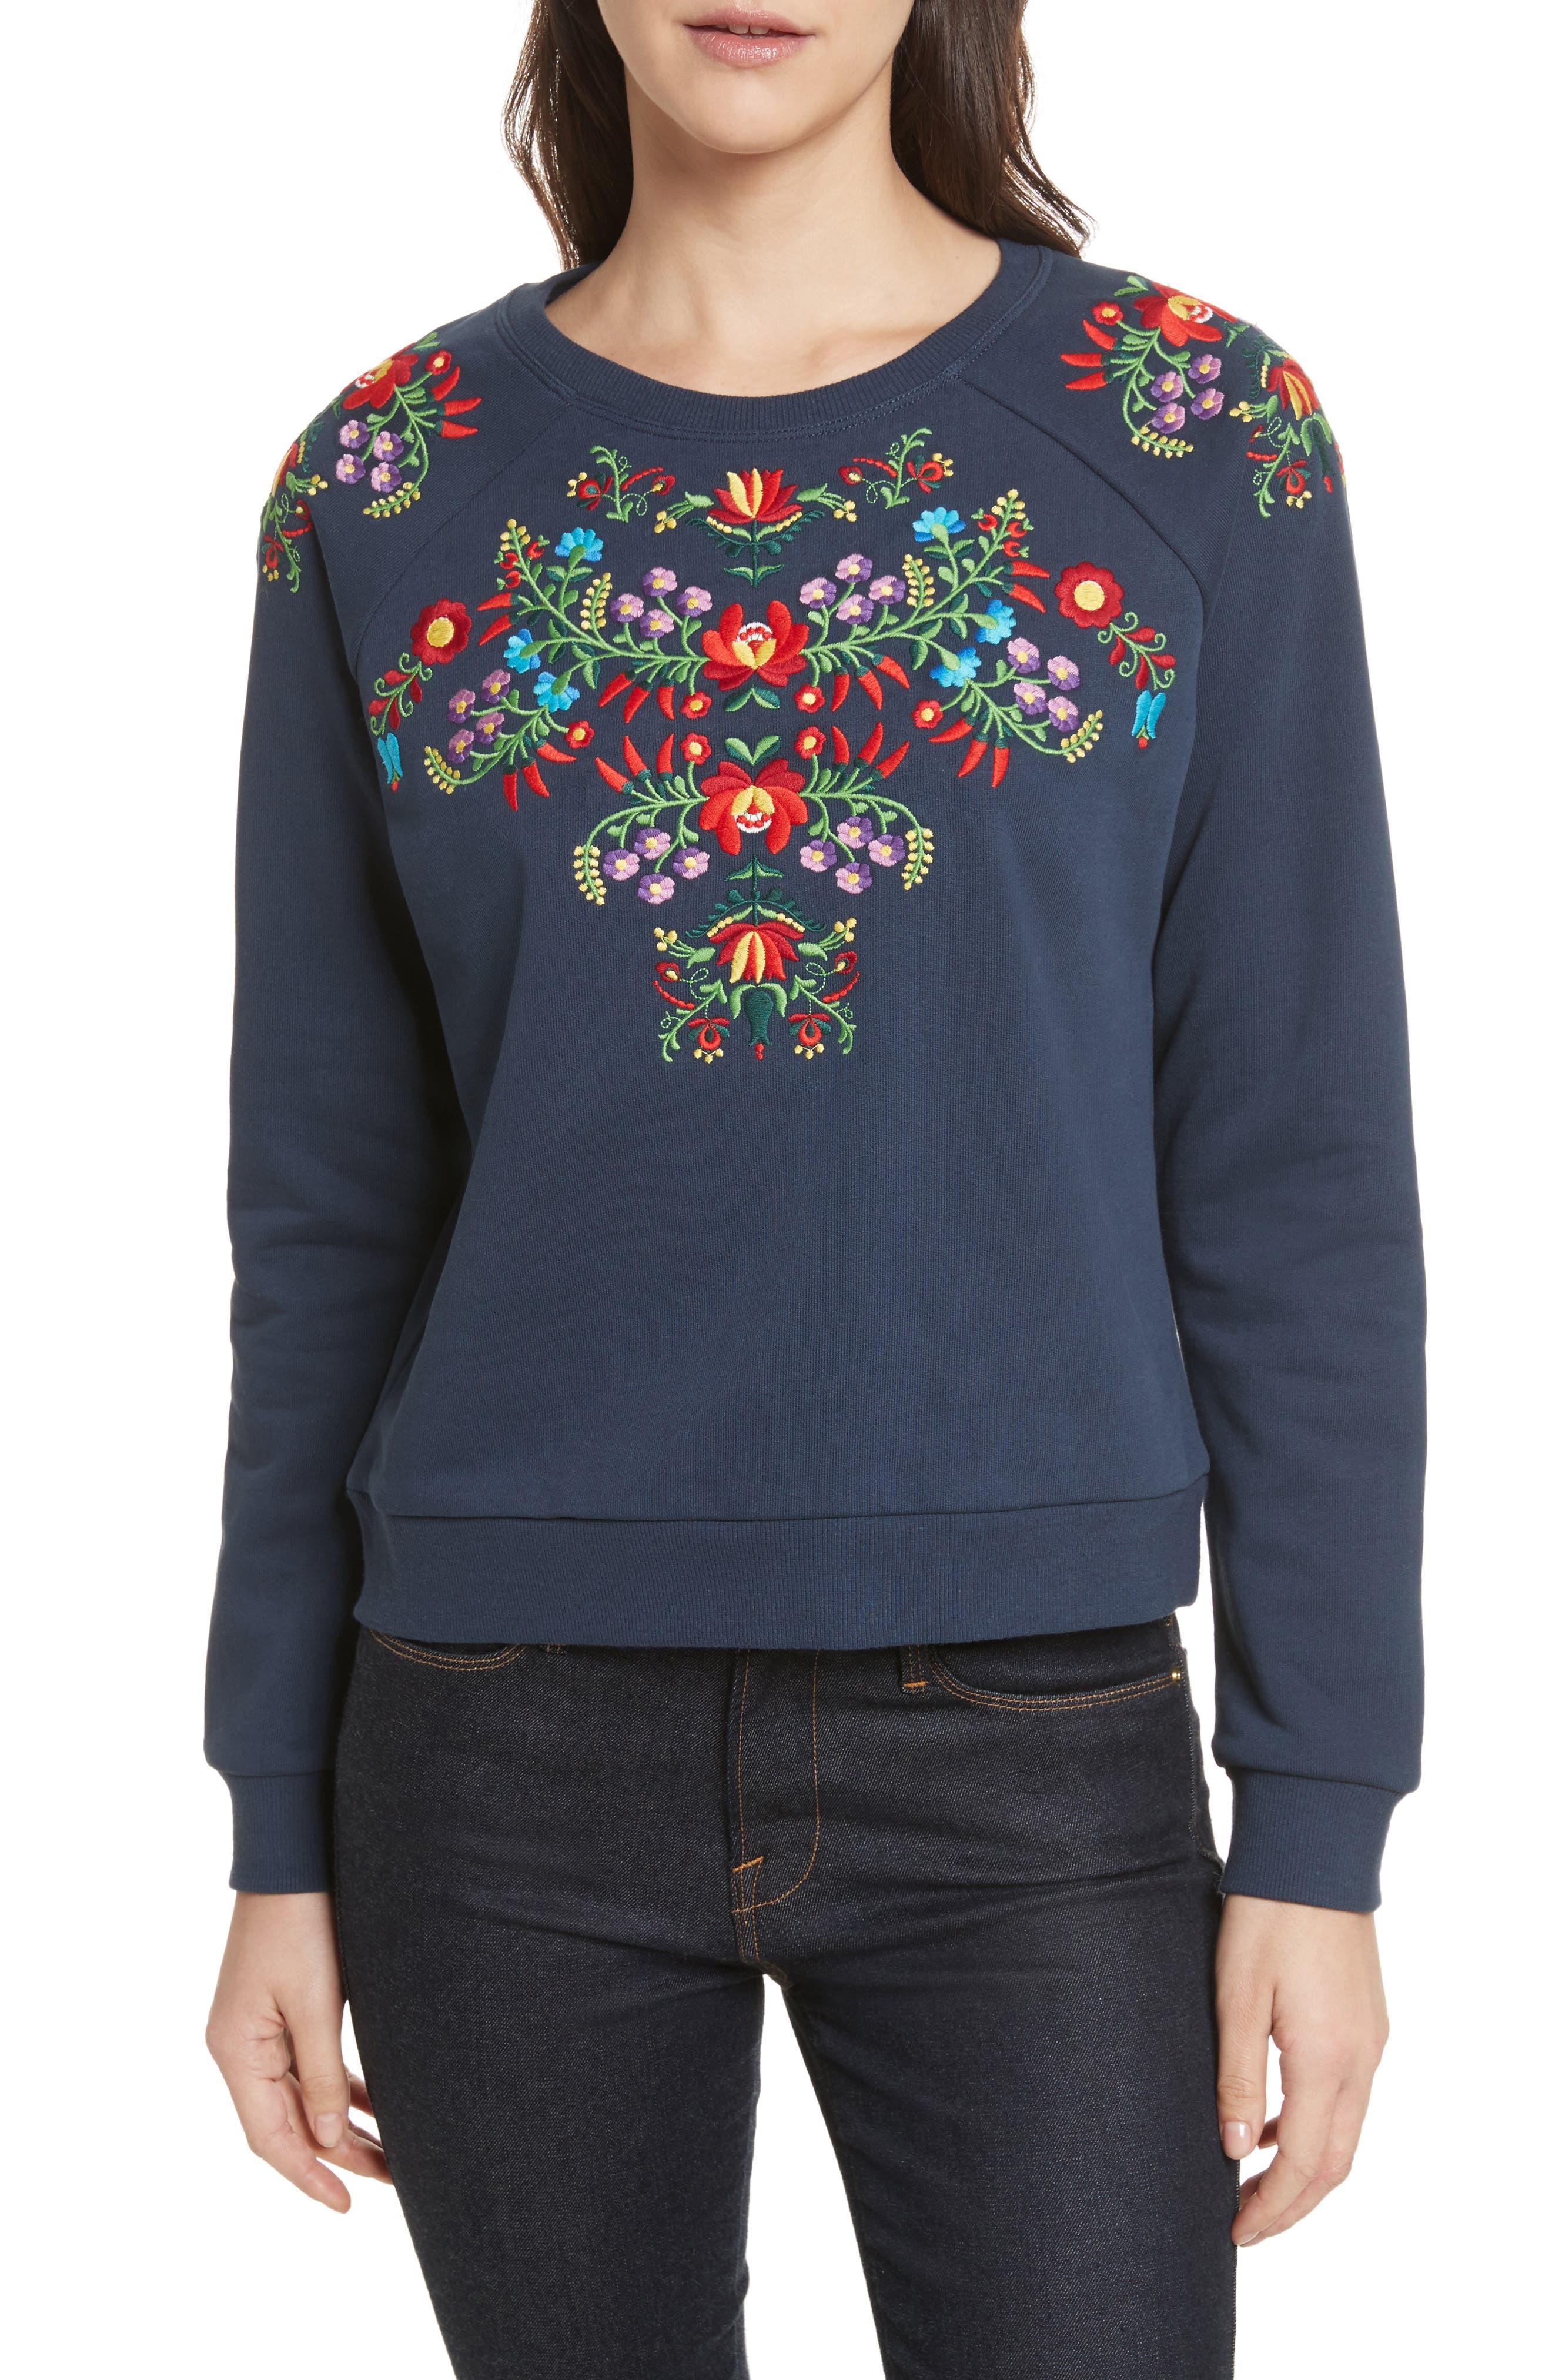 Alternate Image 1 Selected - Rebecca Minkoff Jennings Sweatshirt